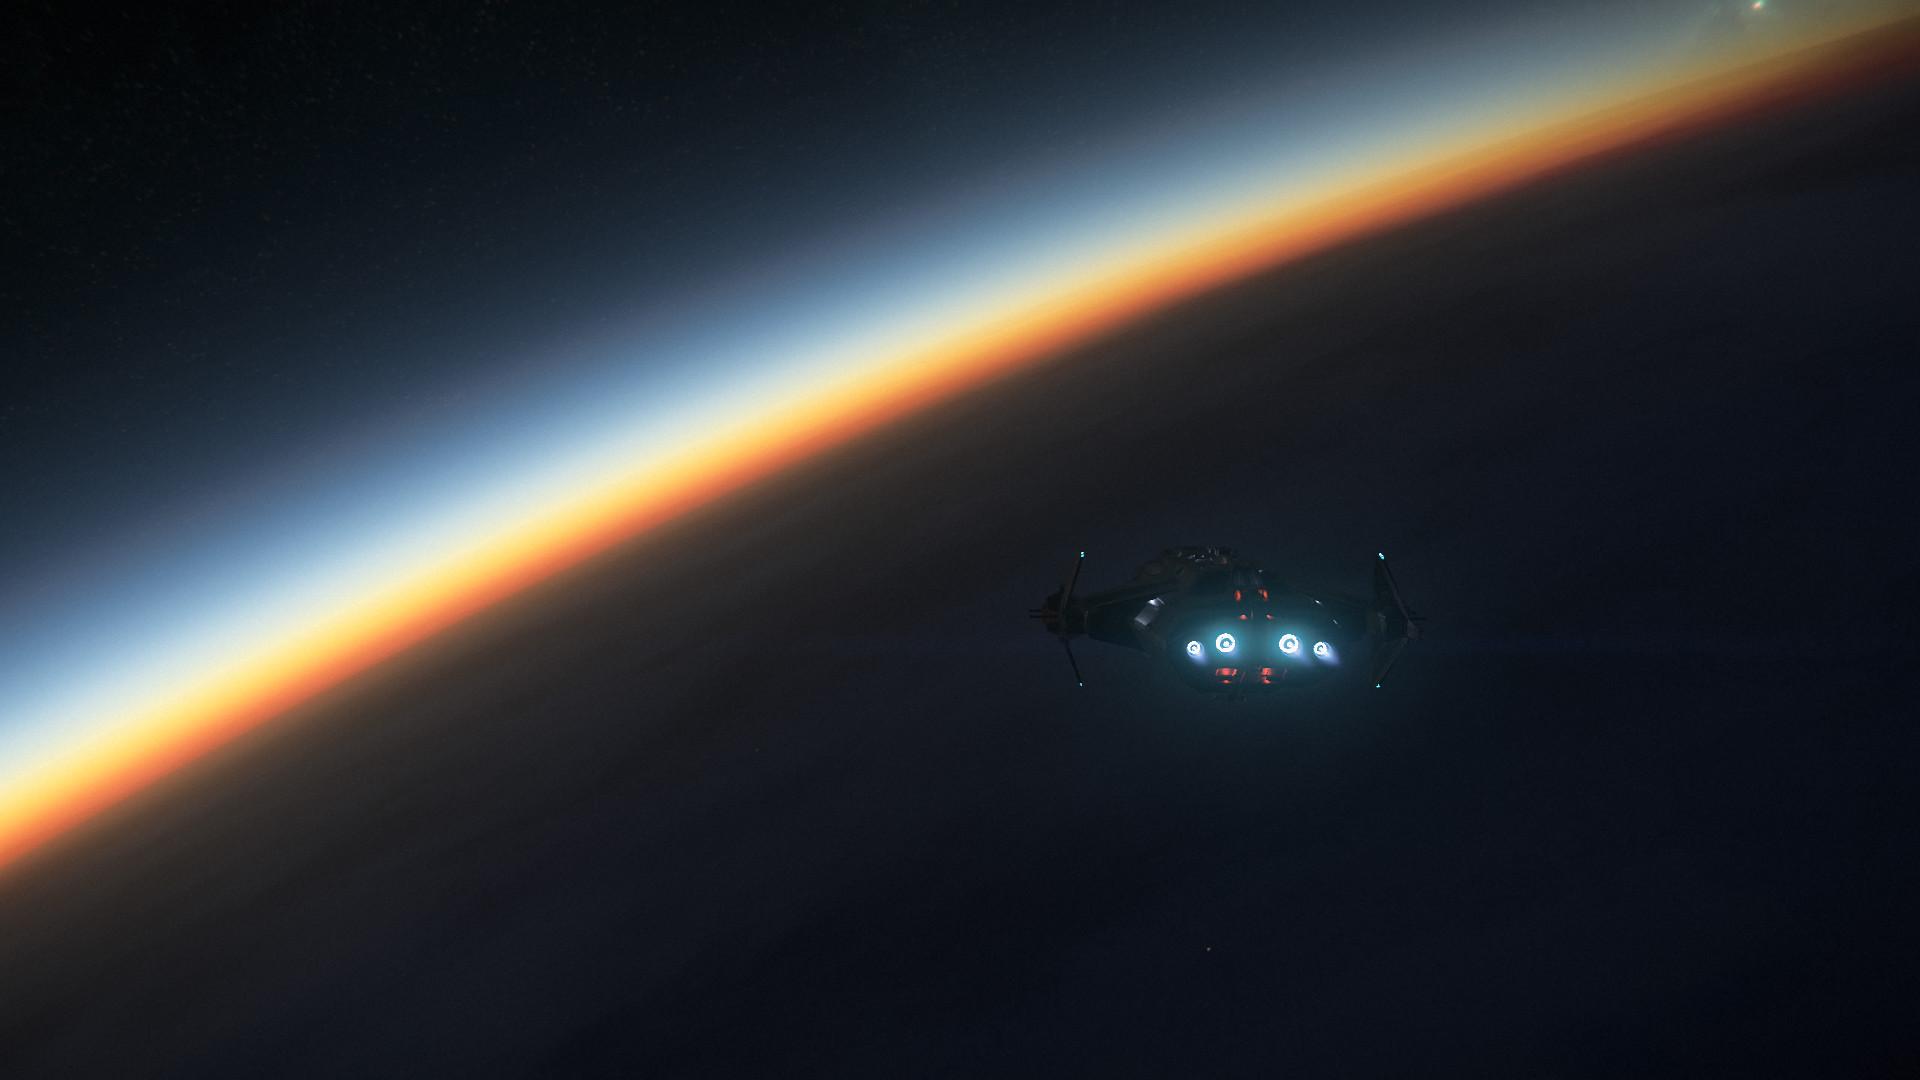 General 1920x1080 meteorite Star Citizen Robert Space Industries space stars video game art video games sunrise Anvil Carrack